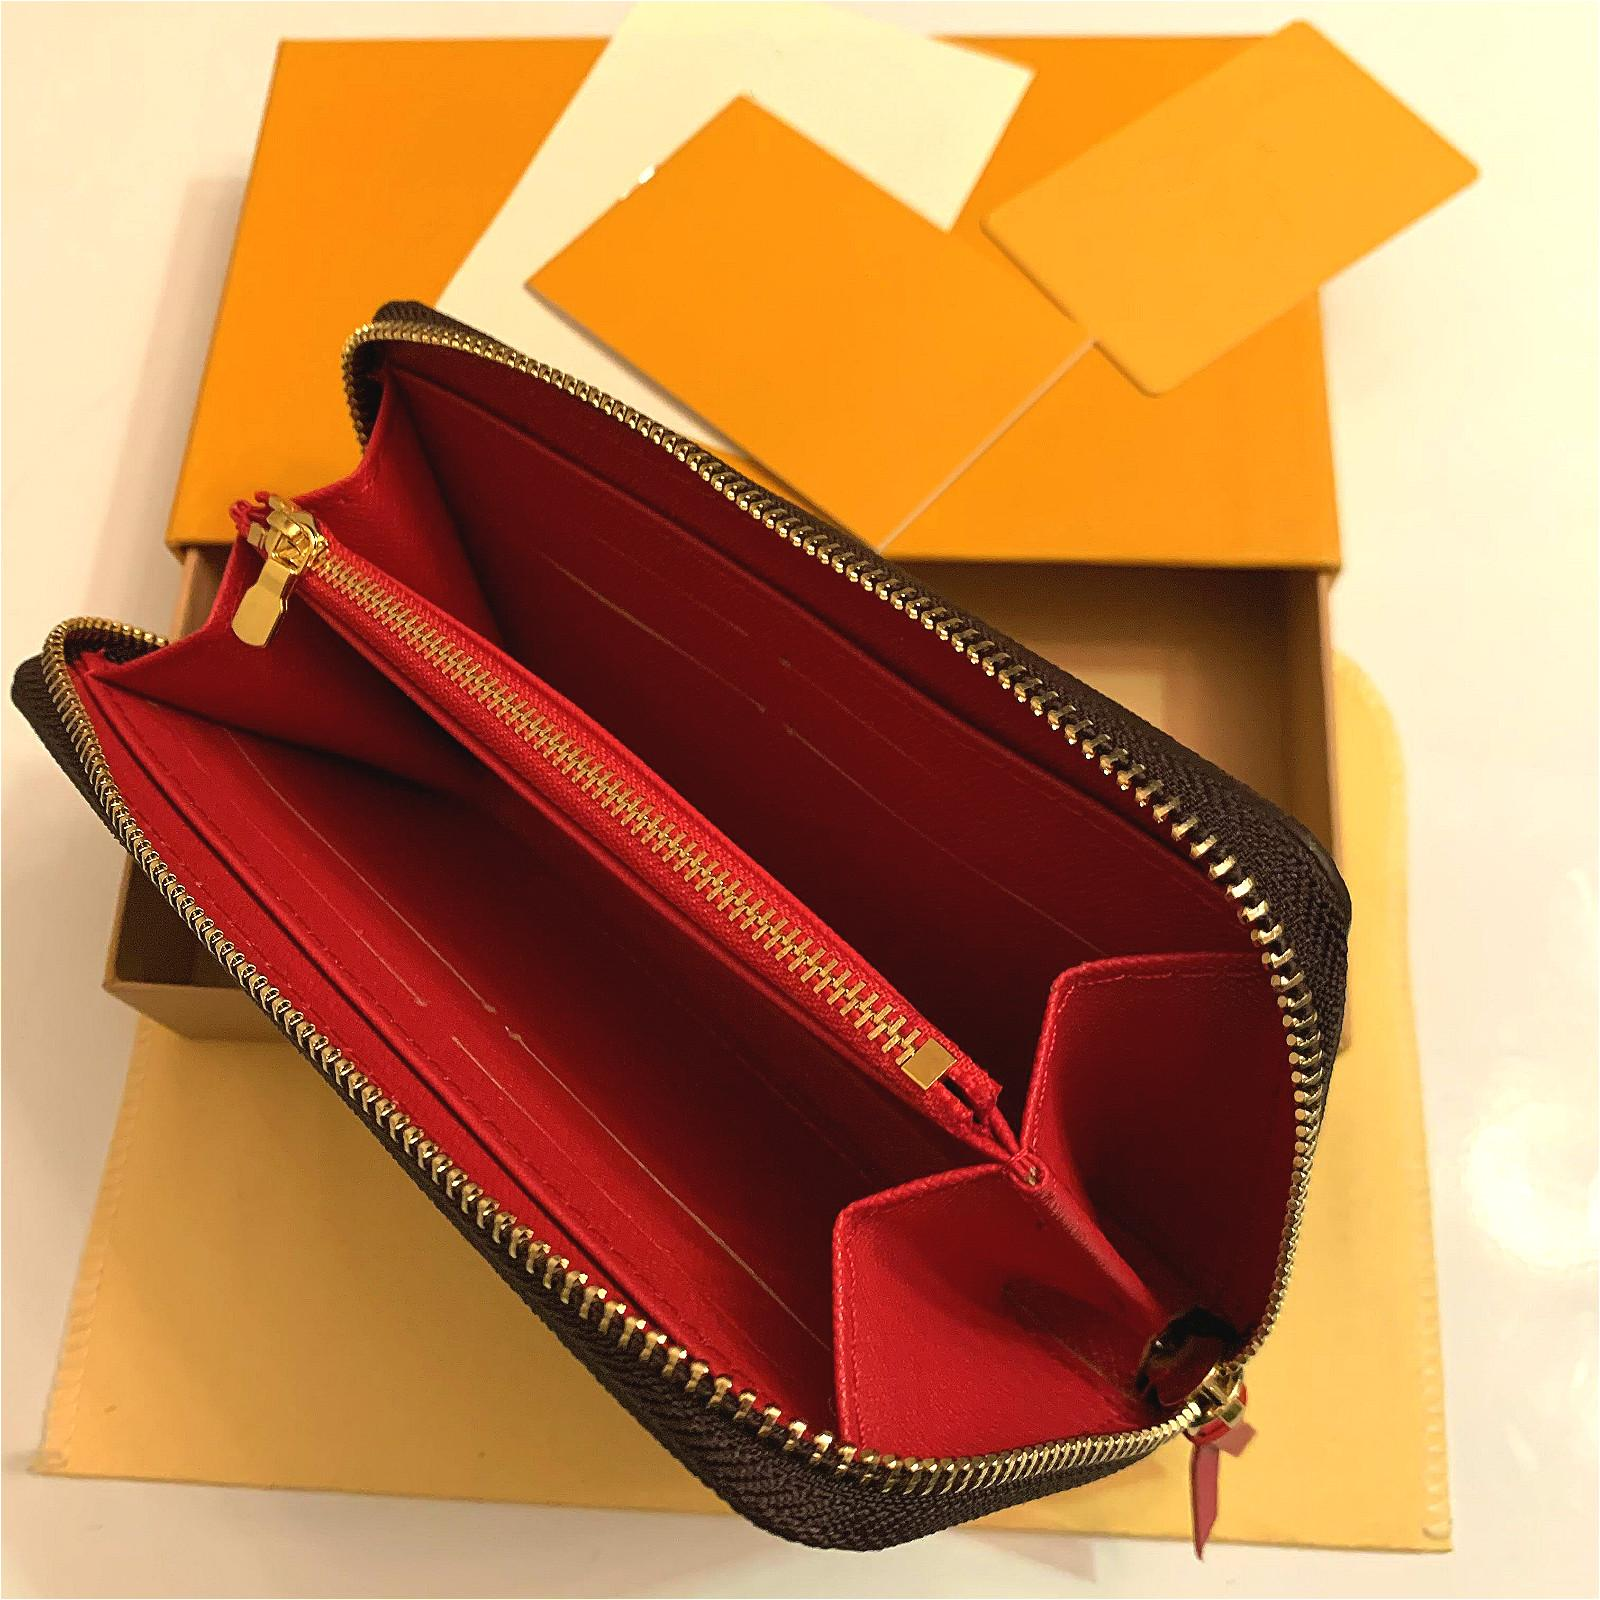 M60742 Clemence кошелек дизайнер женские Zippy длинный холст CLÉMENCE ключевой кошелек чехол монеты кошелек держатель карты Case Mini Pochette Accessoires CLES